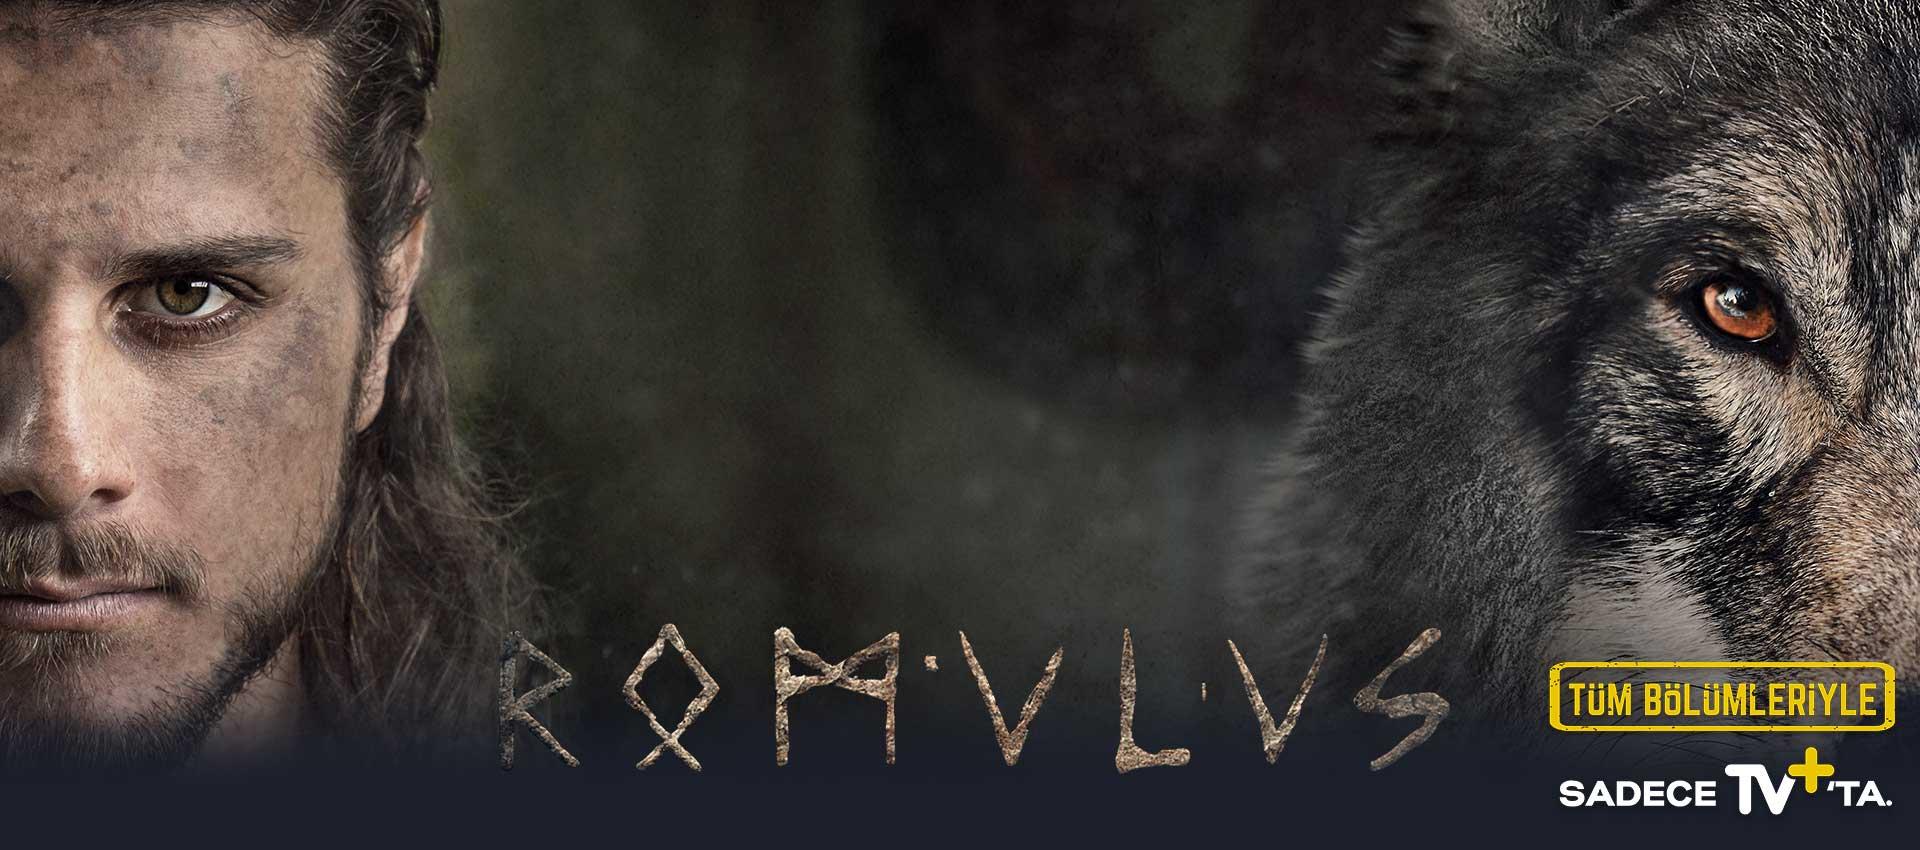 Romulus Dizi İzle türkçe izle hd izle